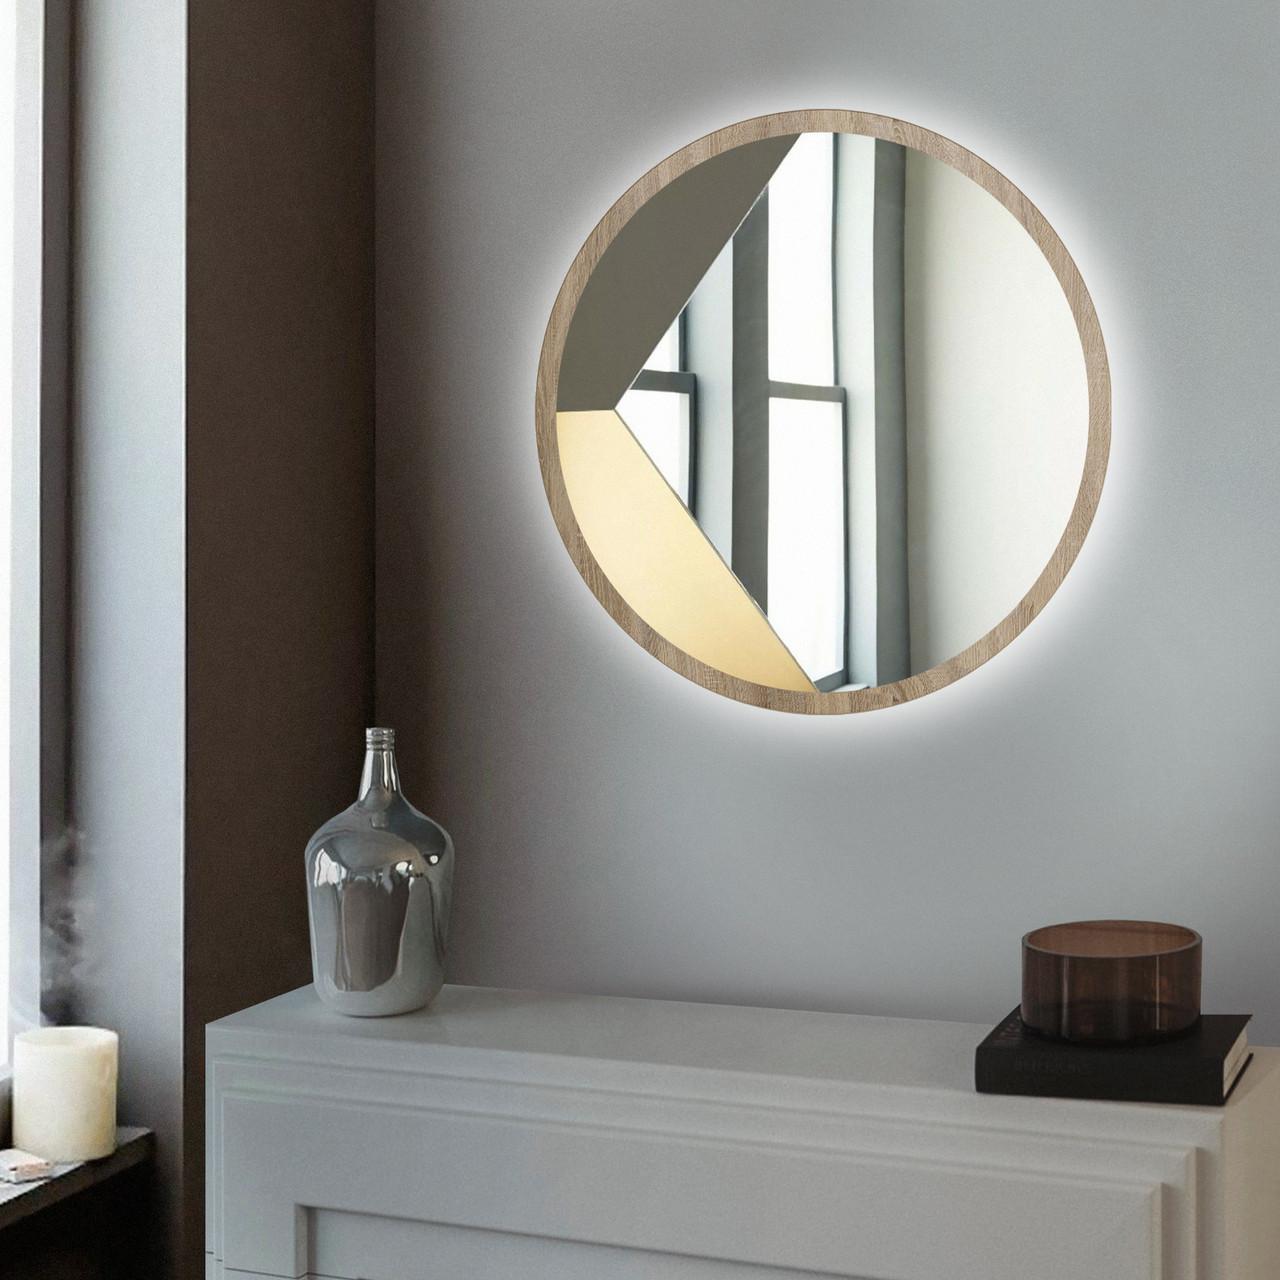 Зеркало настенное с LED подсветкой Art-Com 600 мм Дуб сонома (ZL3)